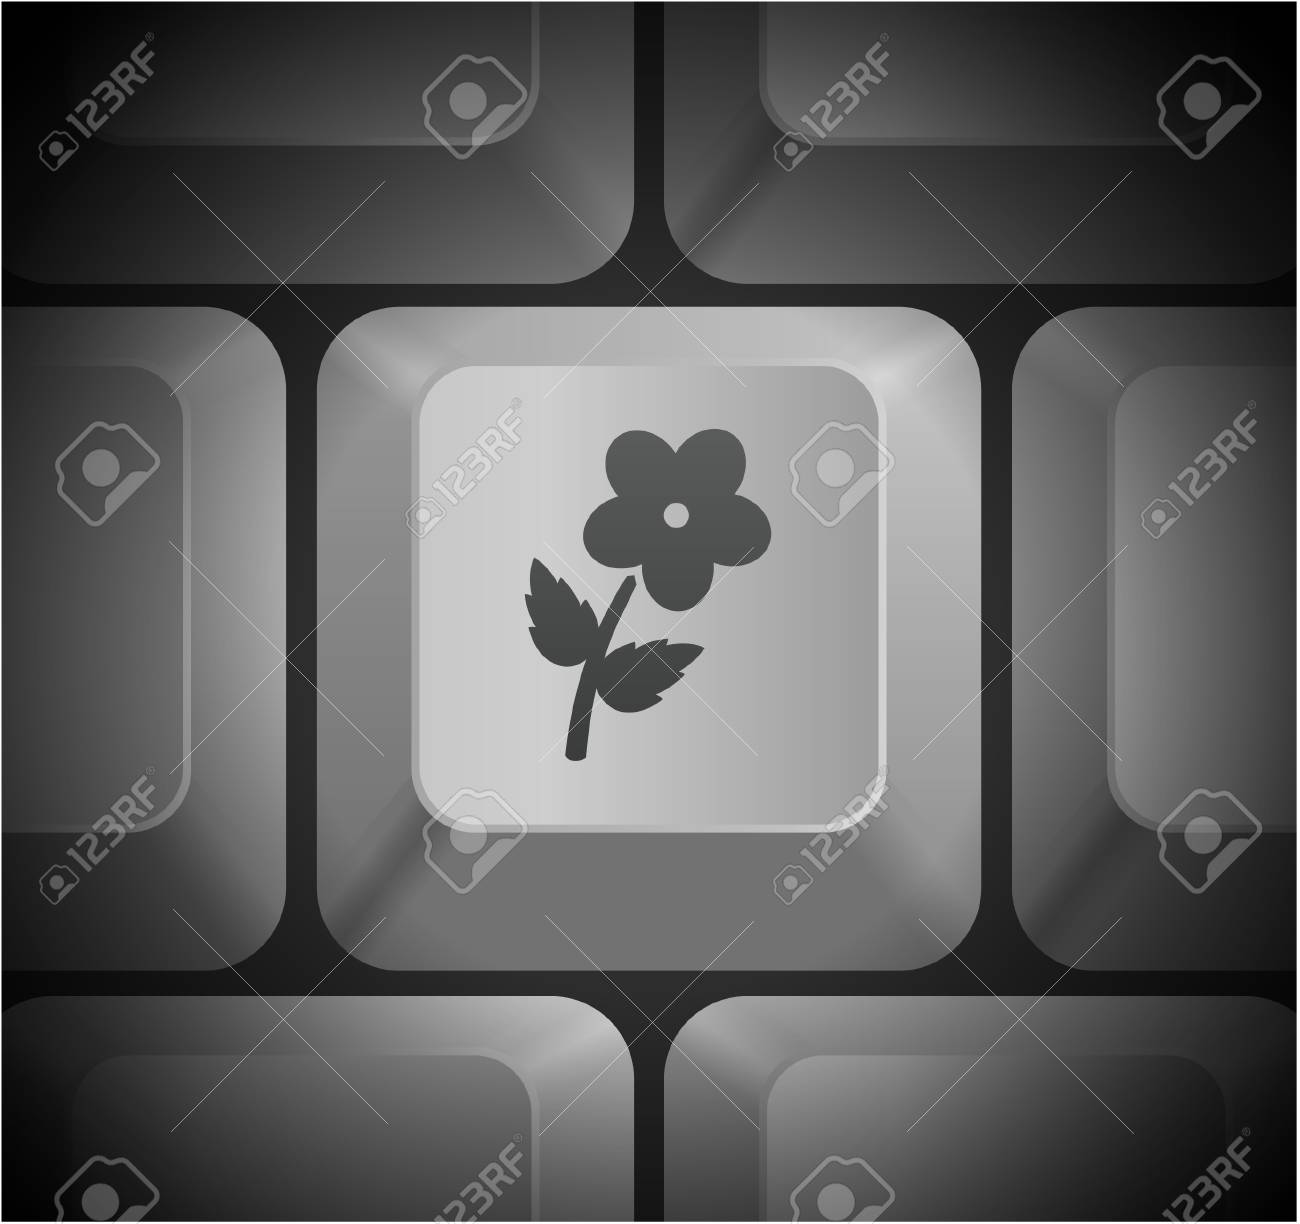 Flower Icon On Computer Keyboard Original Illustration Royalty Free